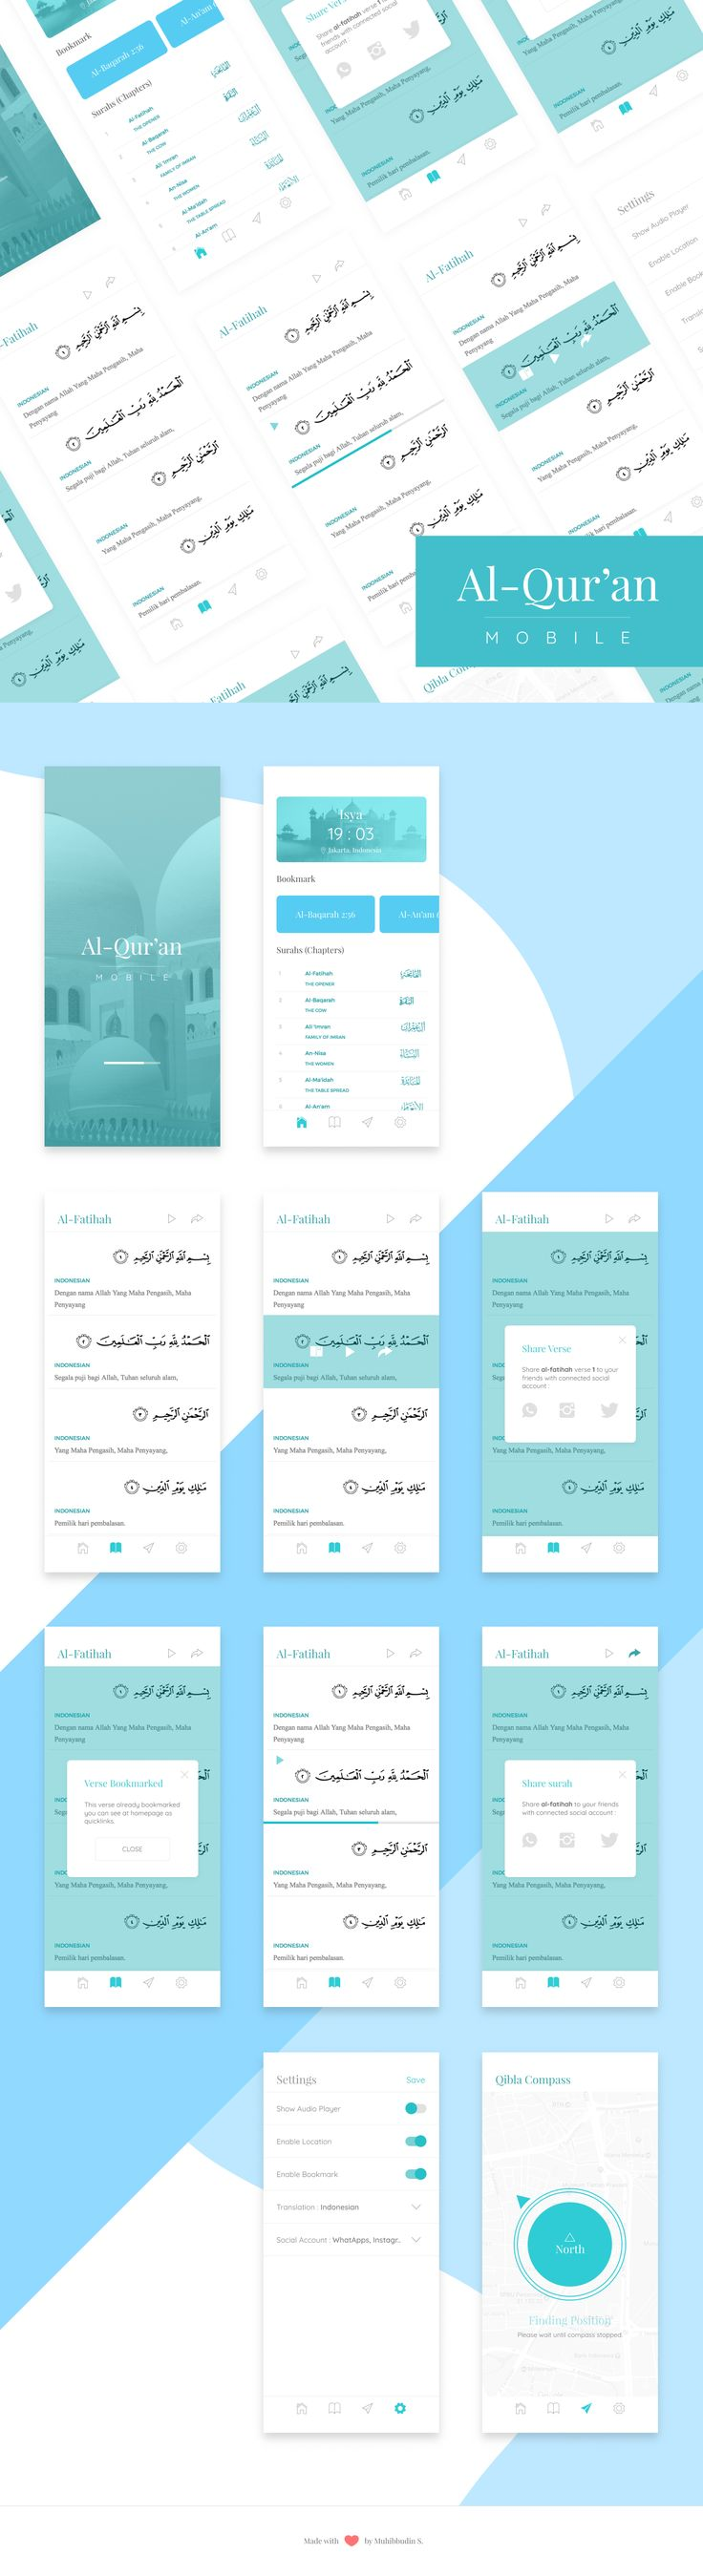 UI Mobile Design for Al-Qur'an Mobile